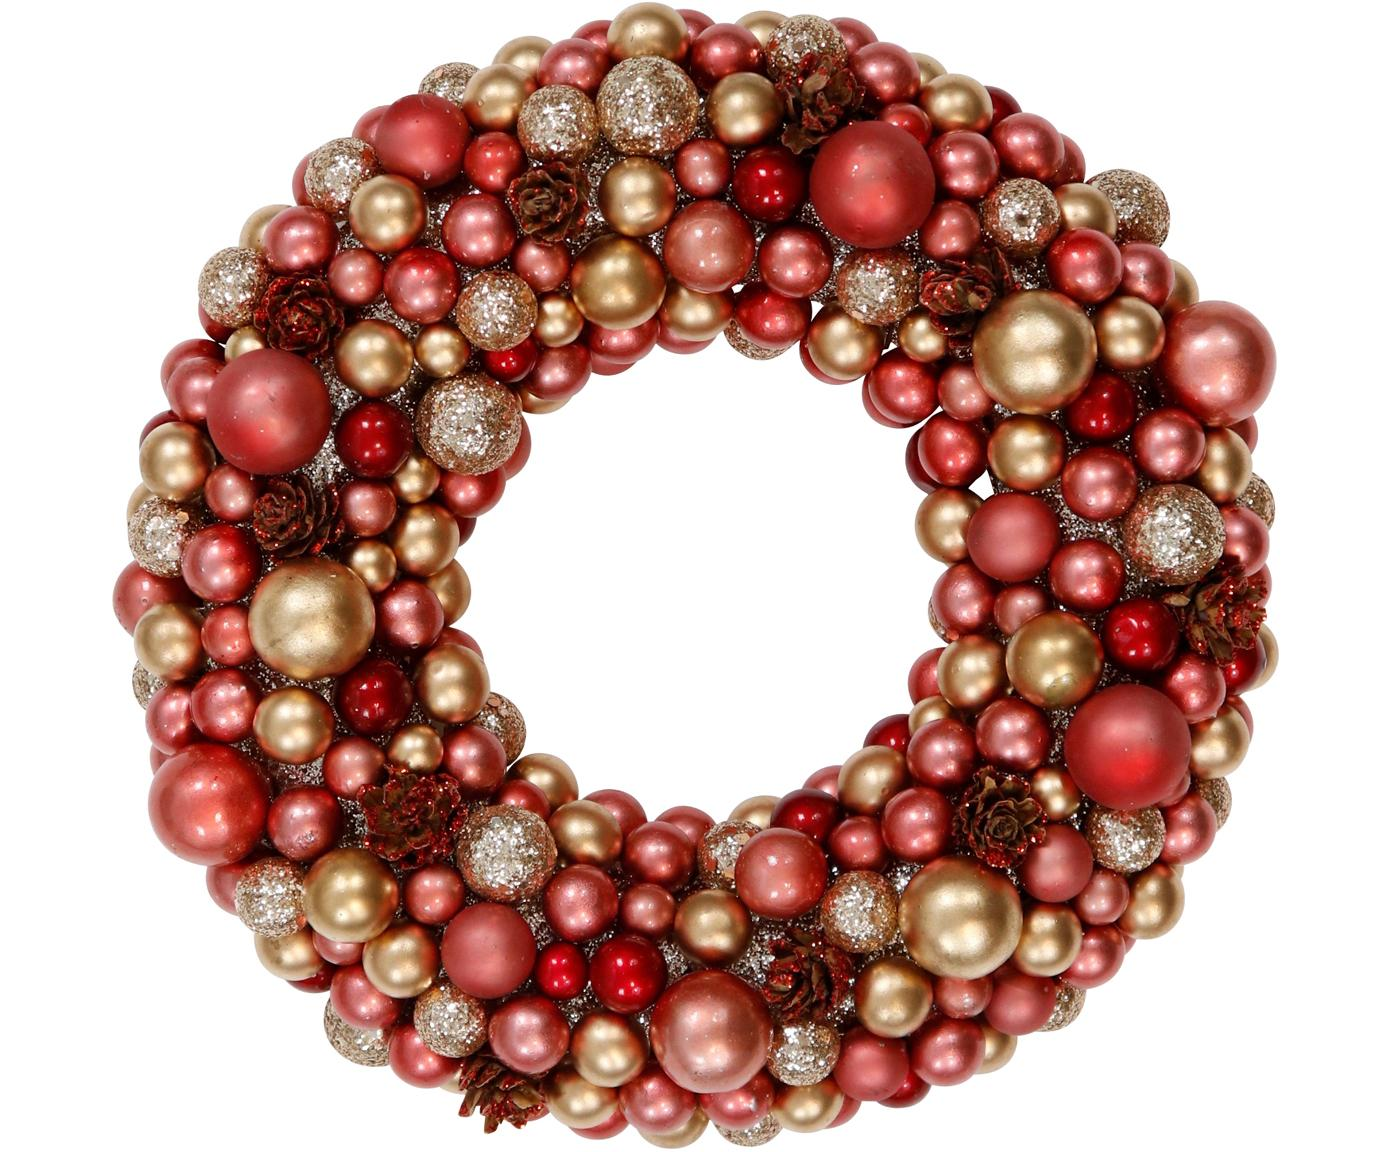 Weihnachtskranz Festivity, Kunststoff, Styropor, Rot, Goldfarben, Ø 25 x H 6 cm